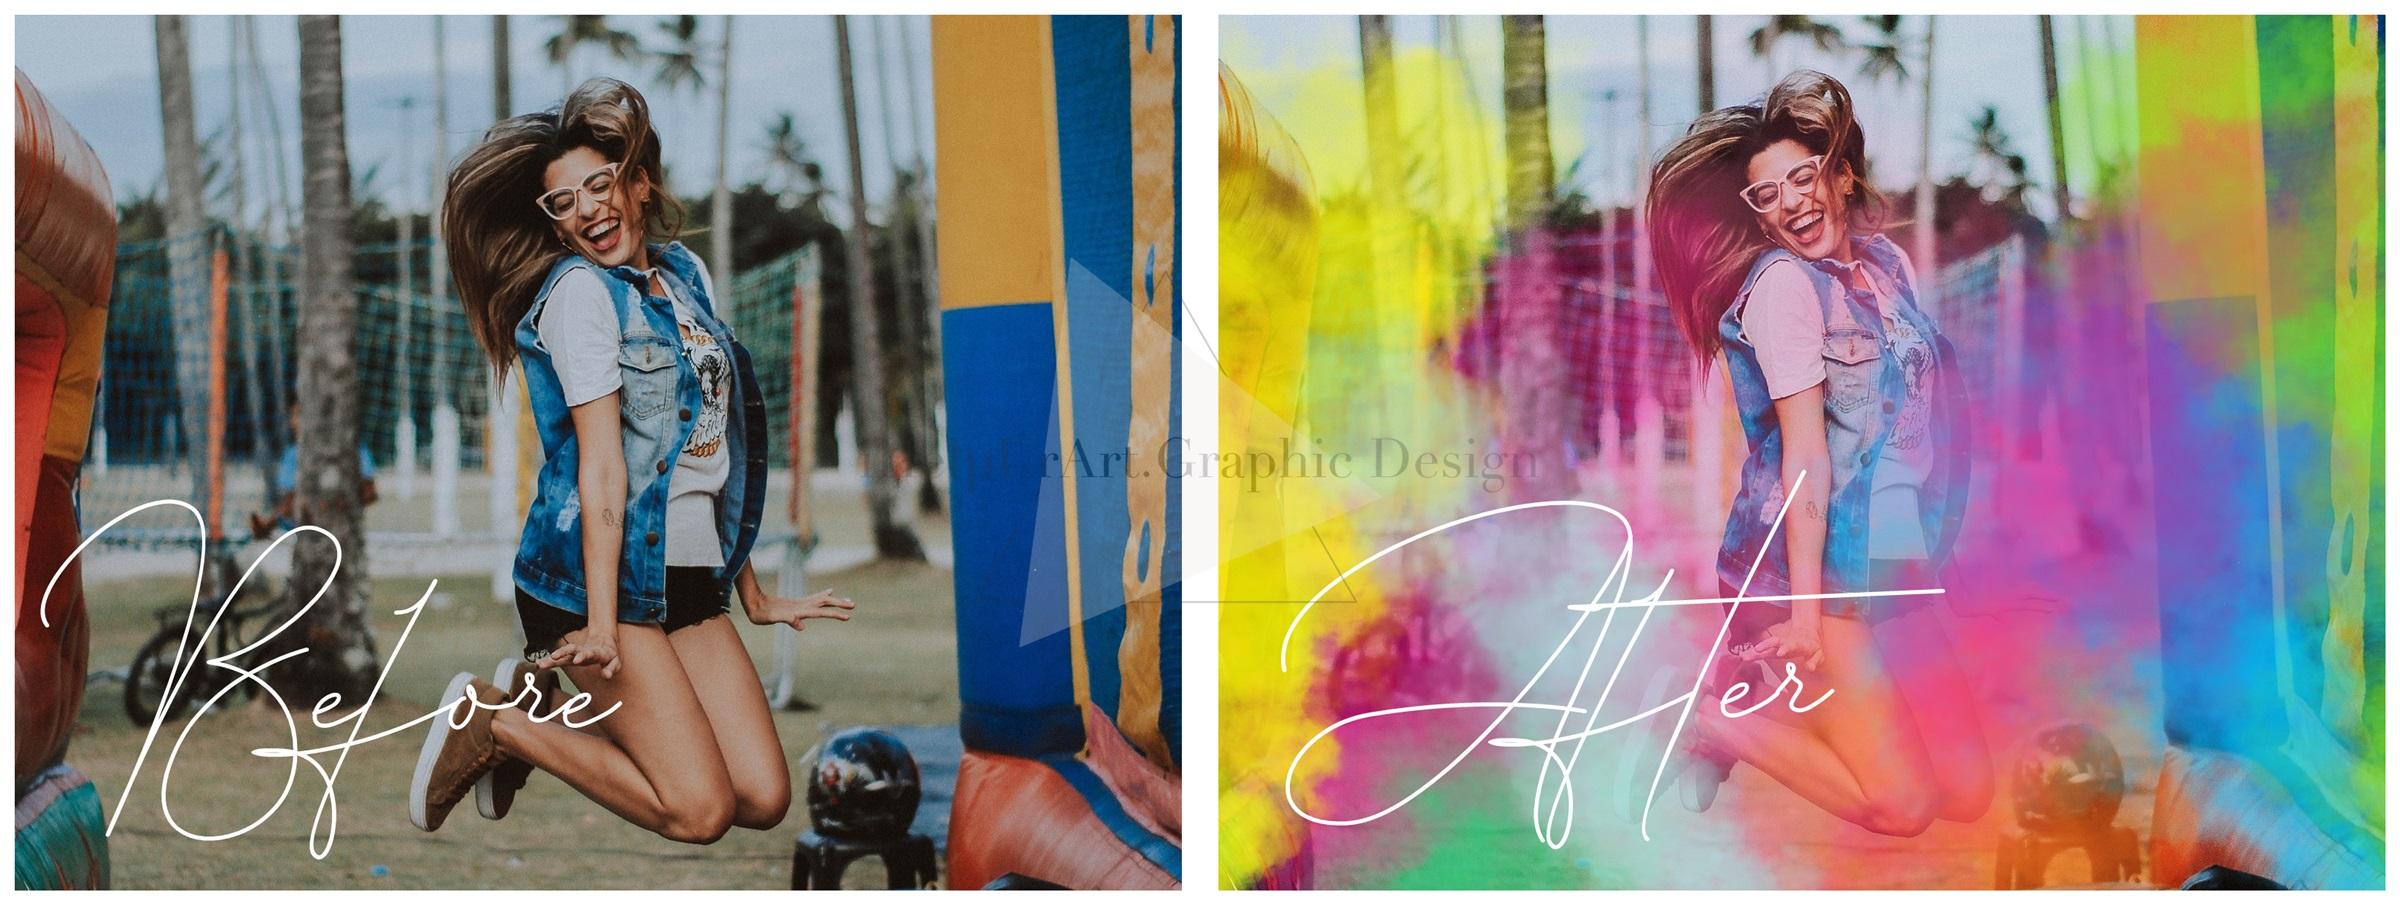 Smoke Photo Overlays - Colorful Smoke Clipart example image 3